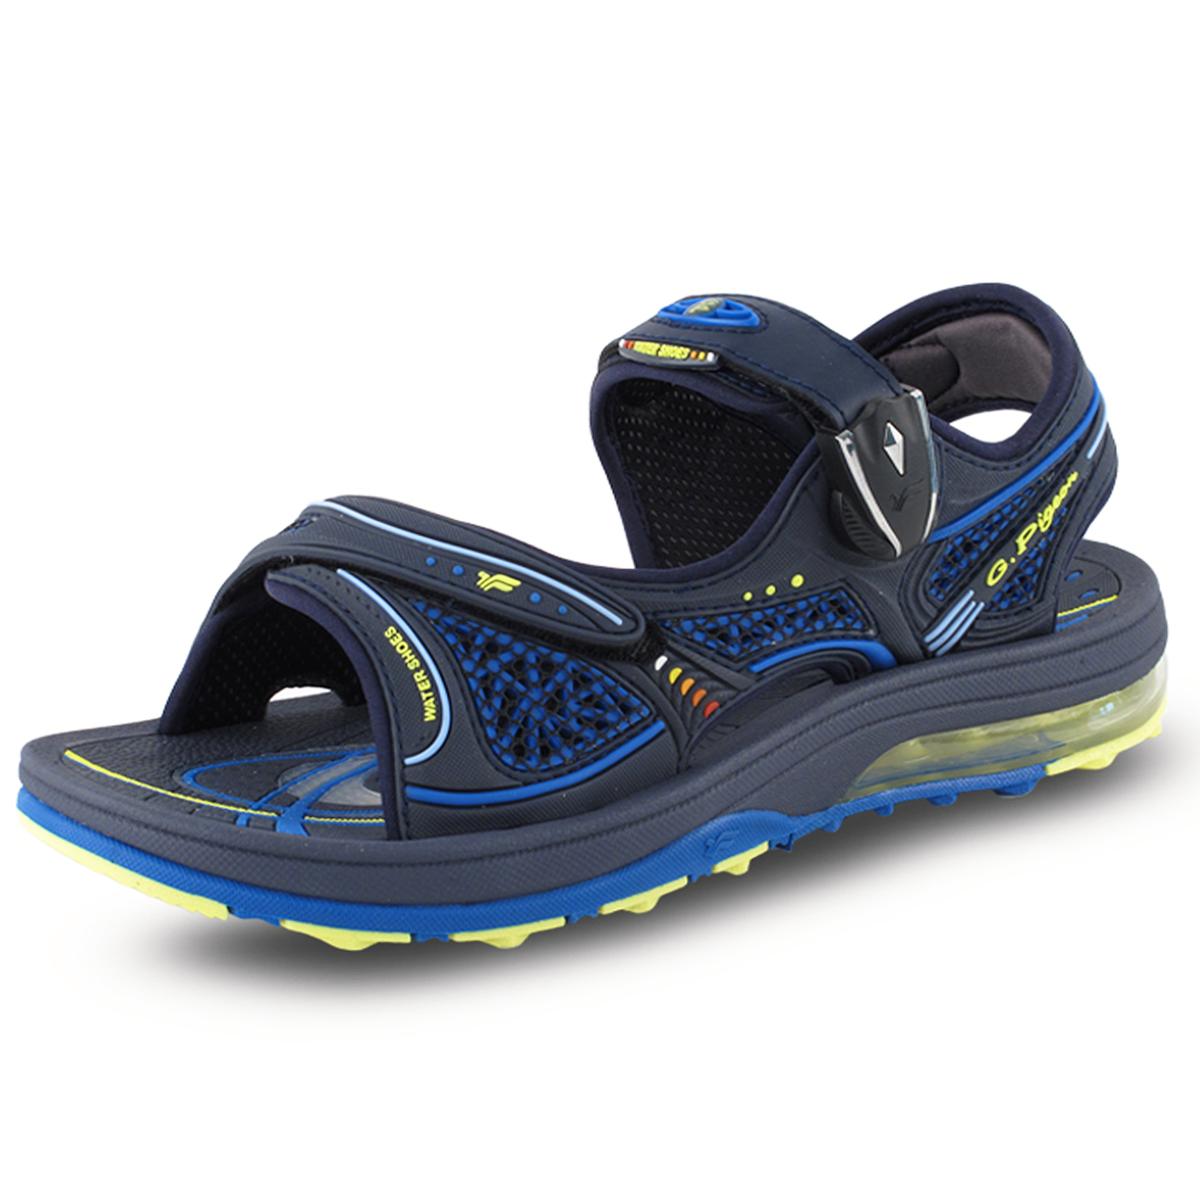 7678 Gold Pigeon Shoes All Purpose Sandals Amp Flip Flops